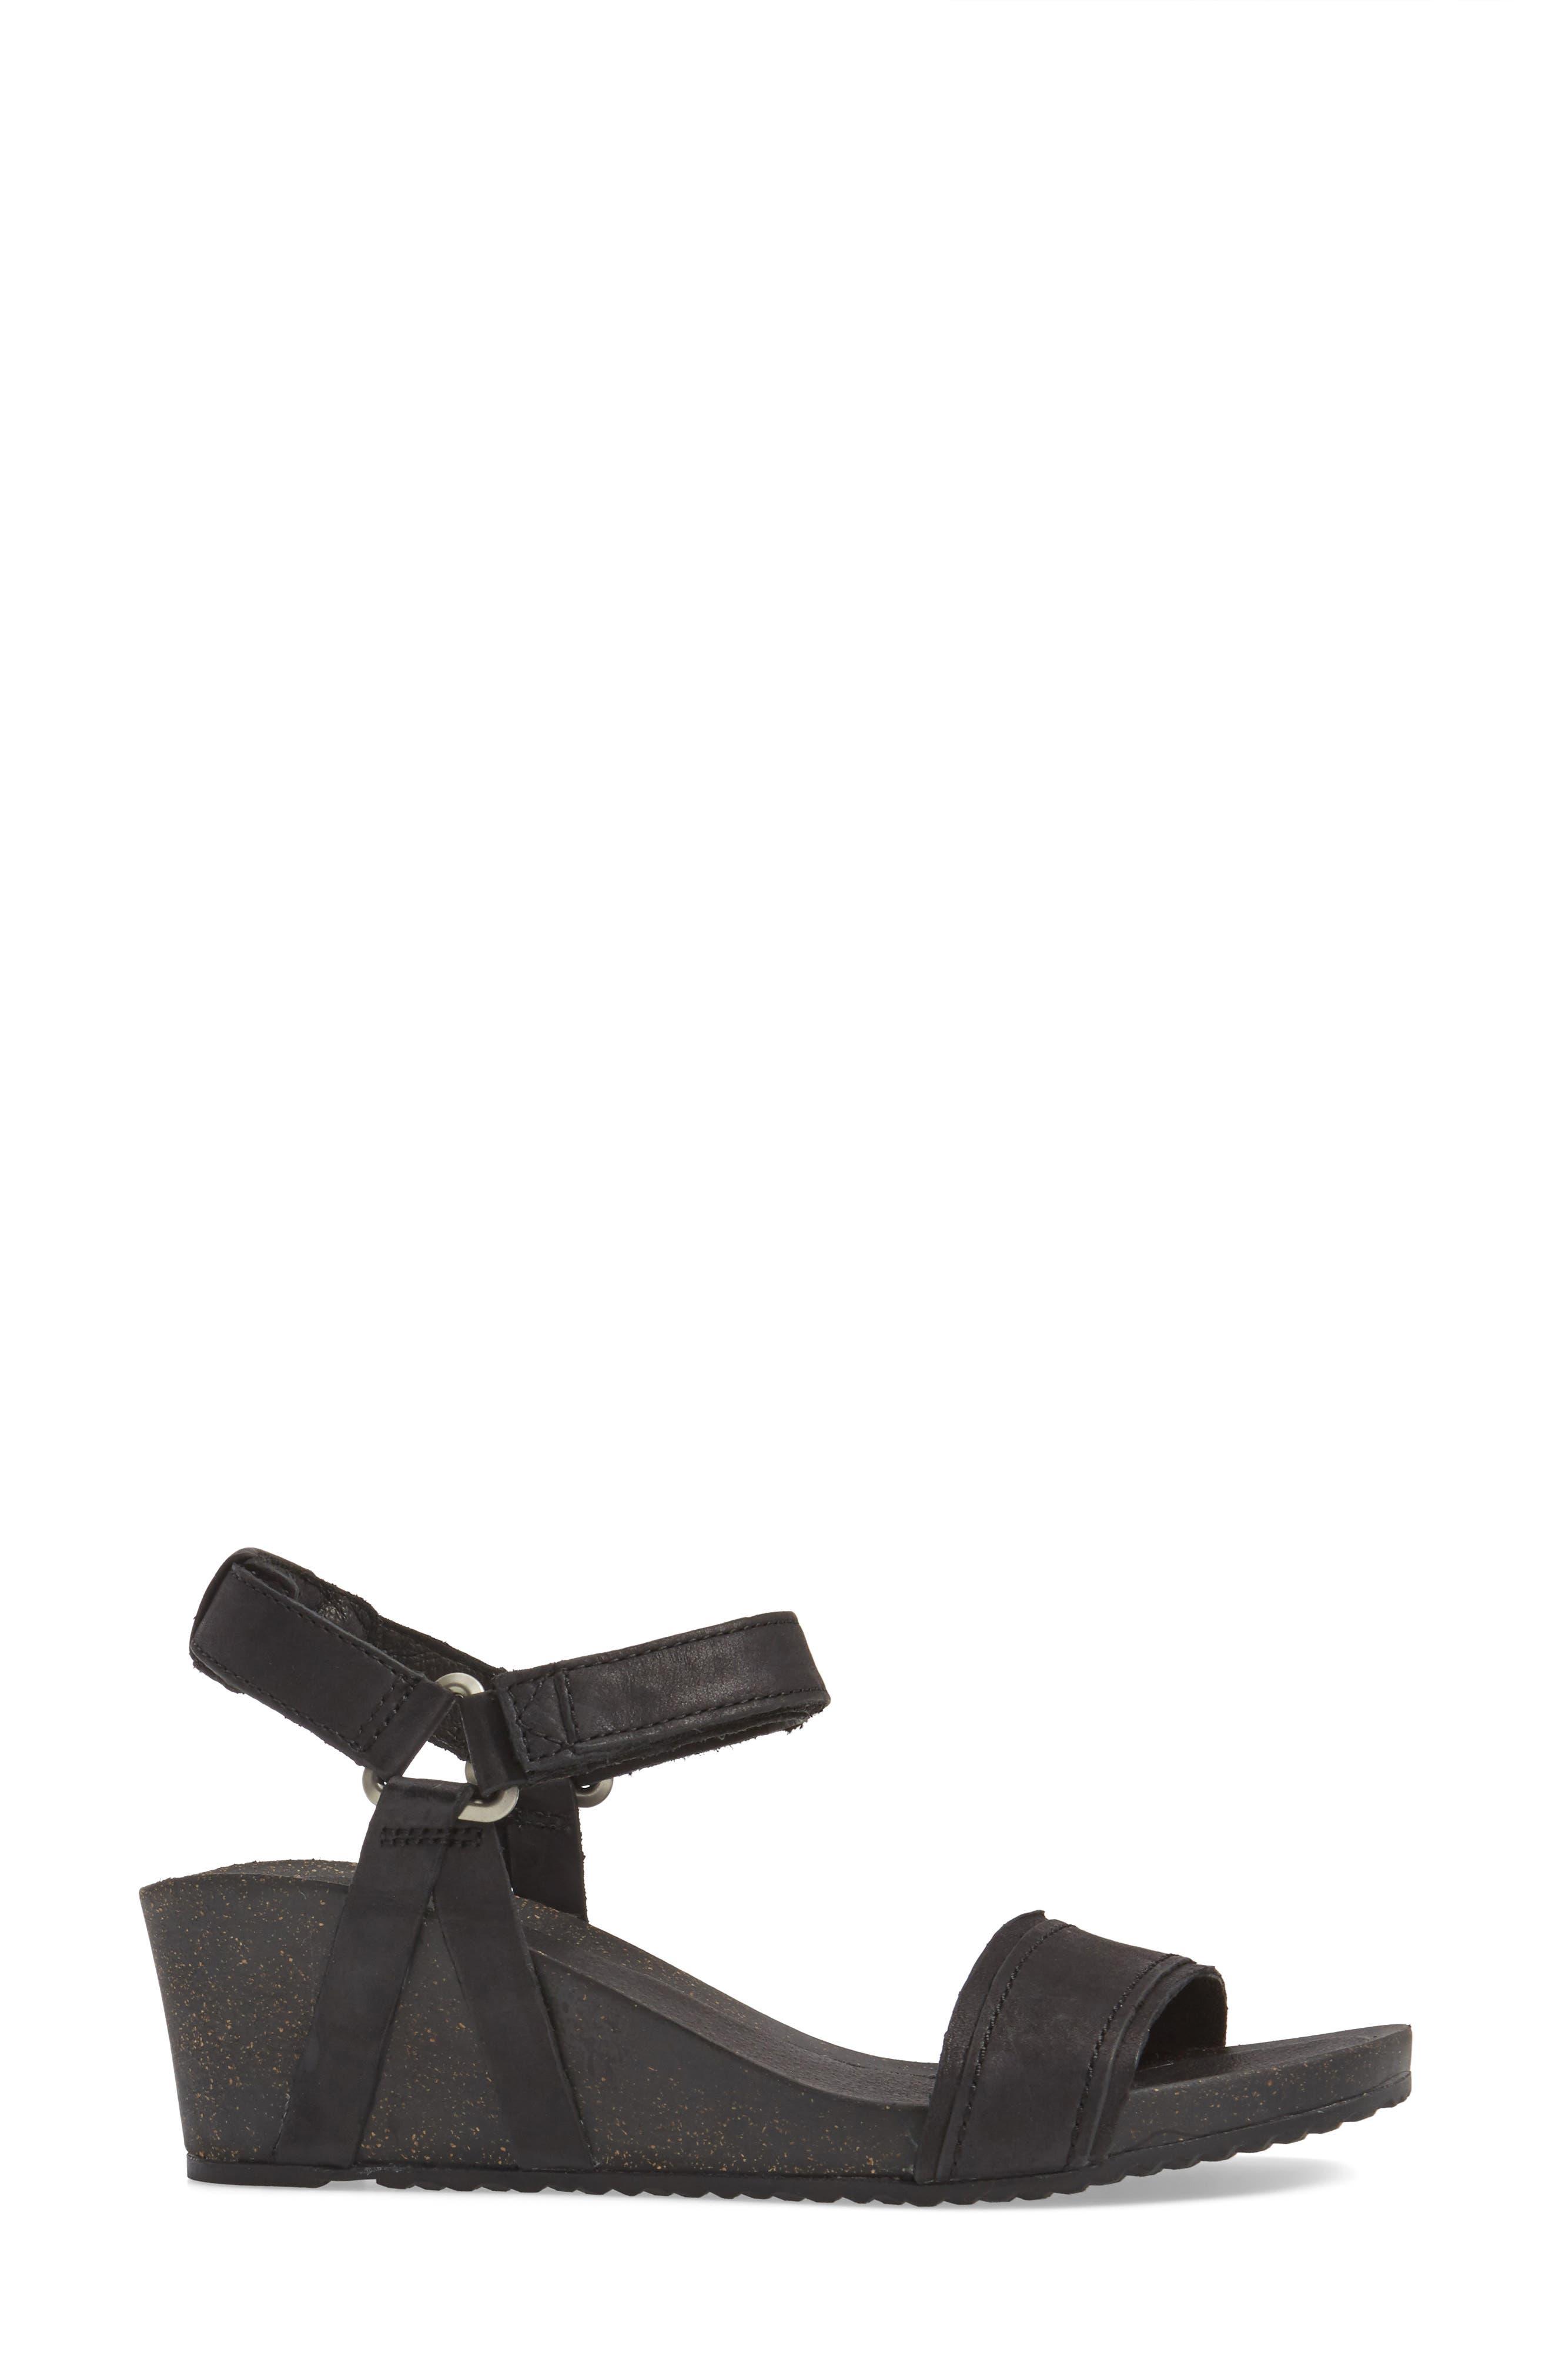 TEVA, Ysidro Stitch Wedge Sandal, Alternate thumbnail 3, color, 001